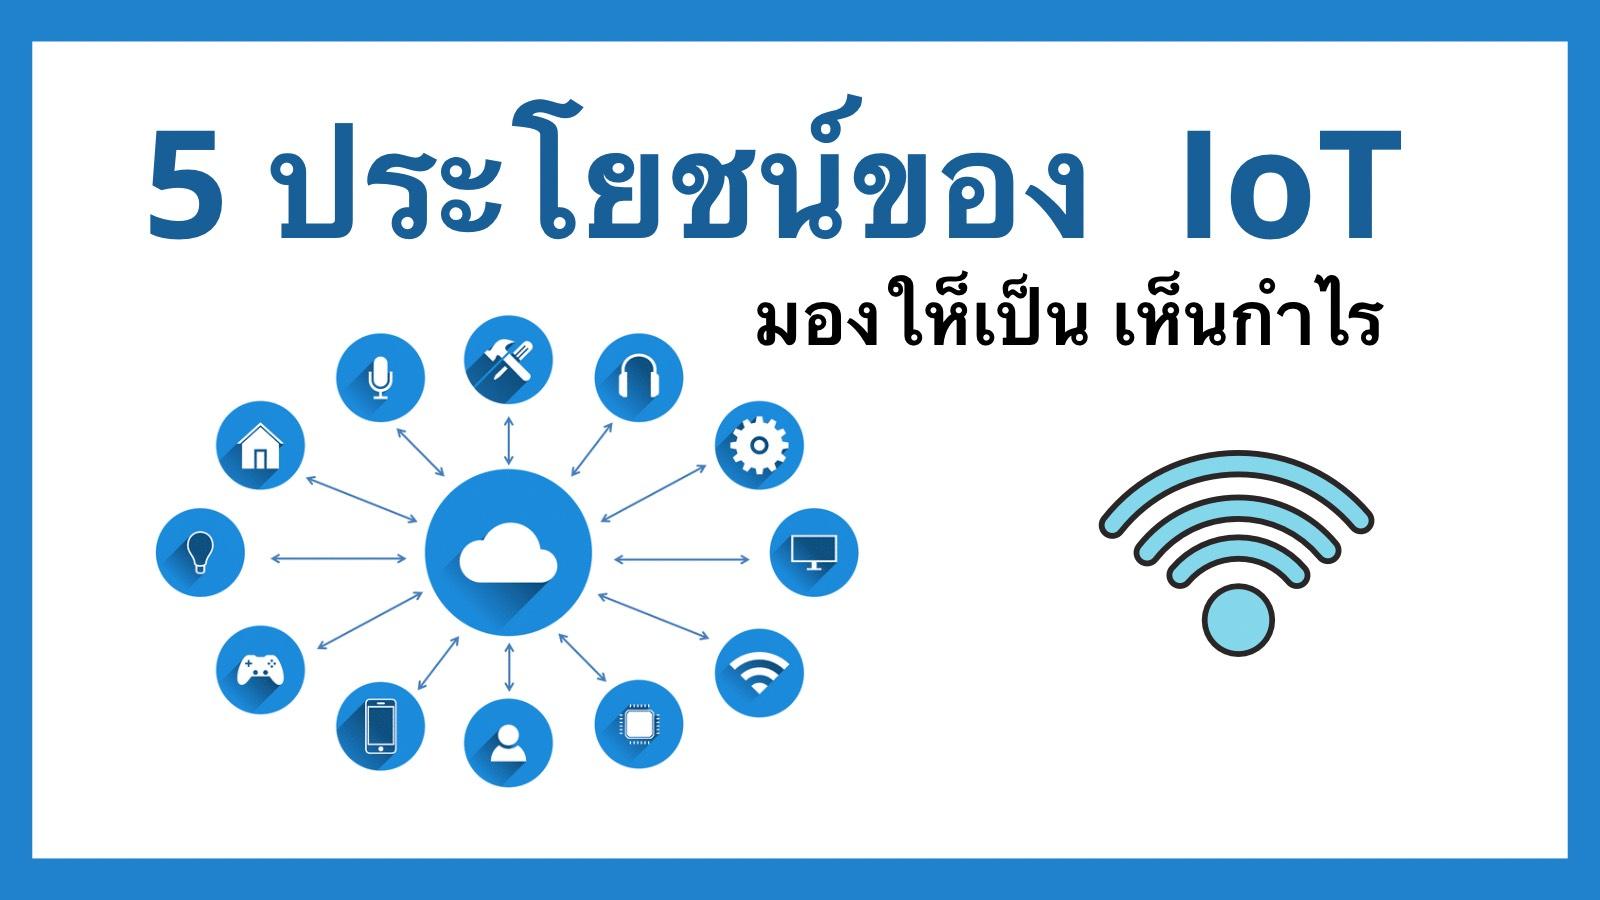 IoT หรือ Internet of Thing มีประโยชน์อย่างไร